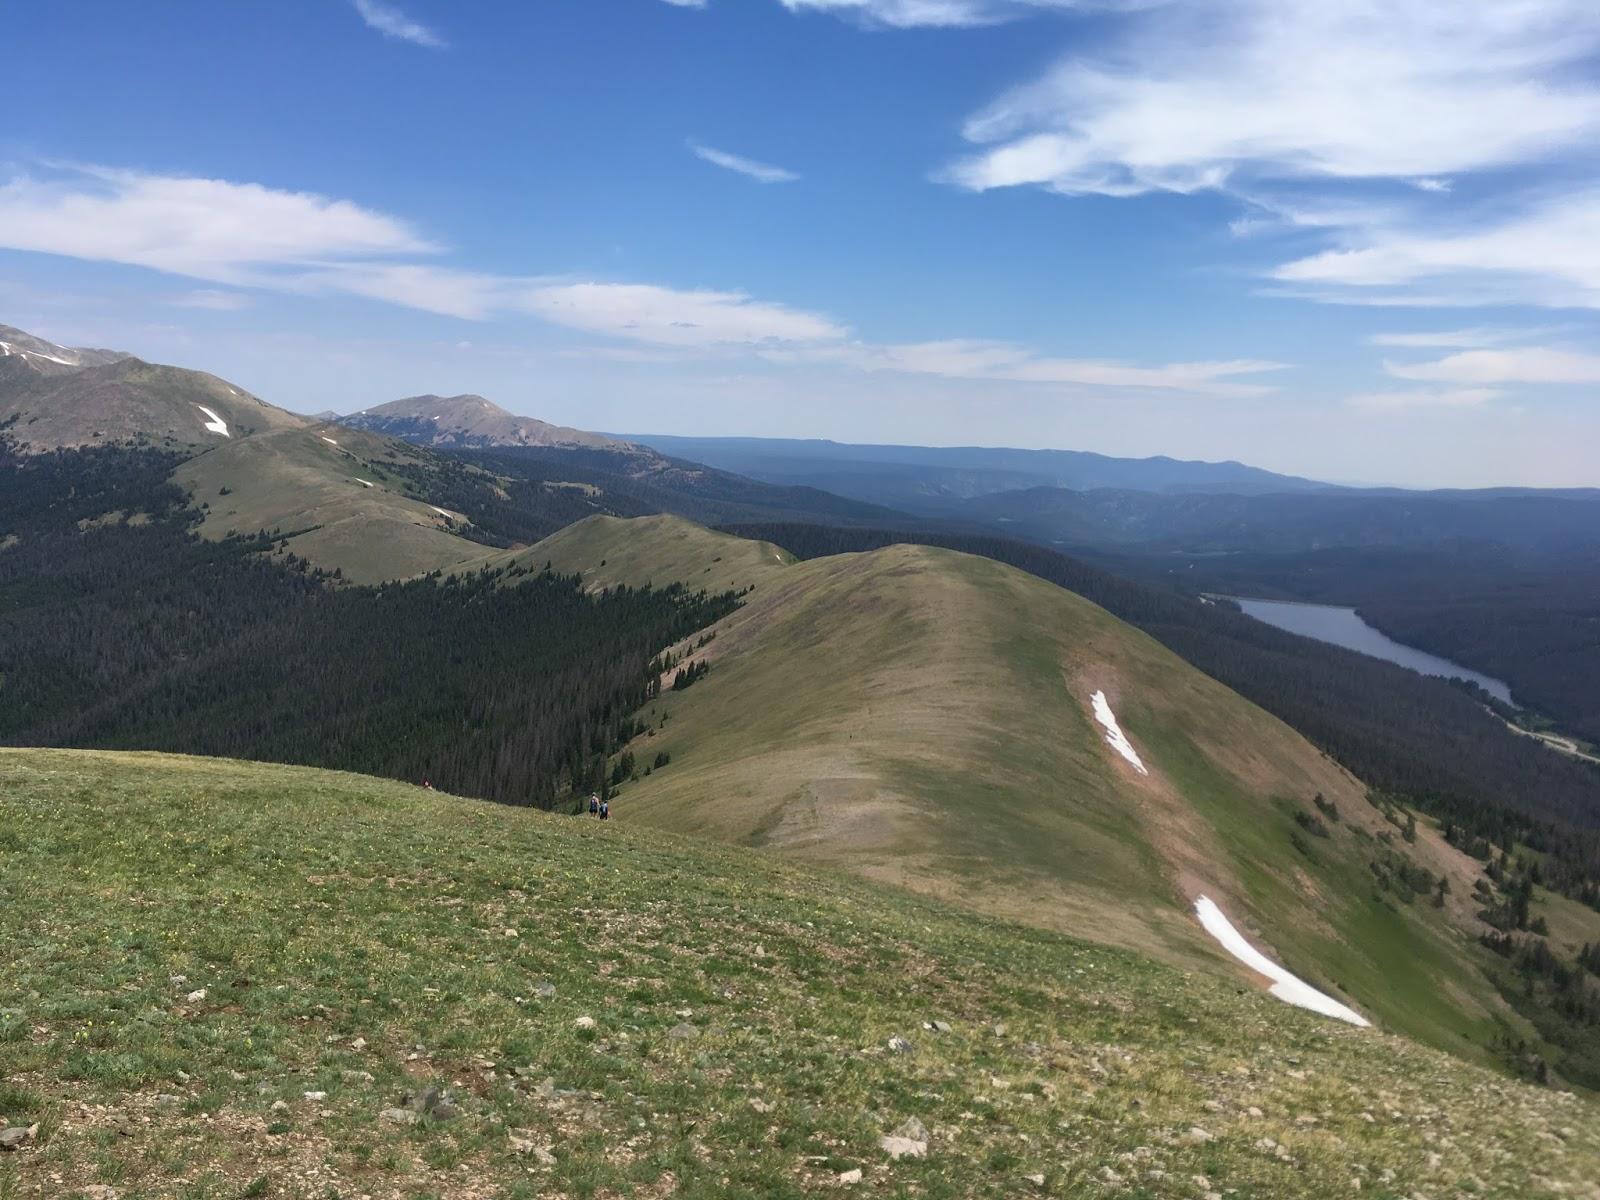 hiking rocky mountain national park july 2017